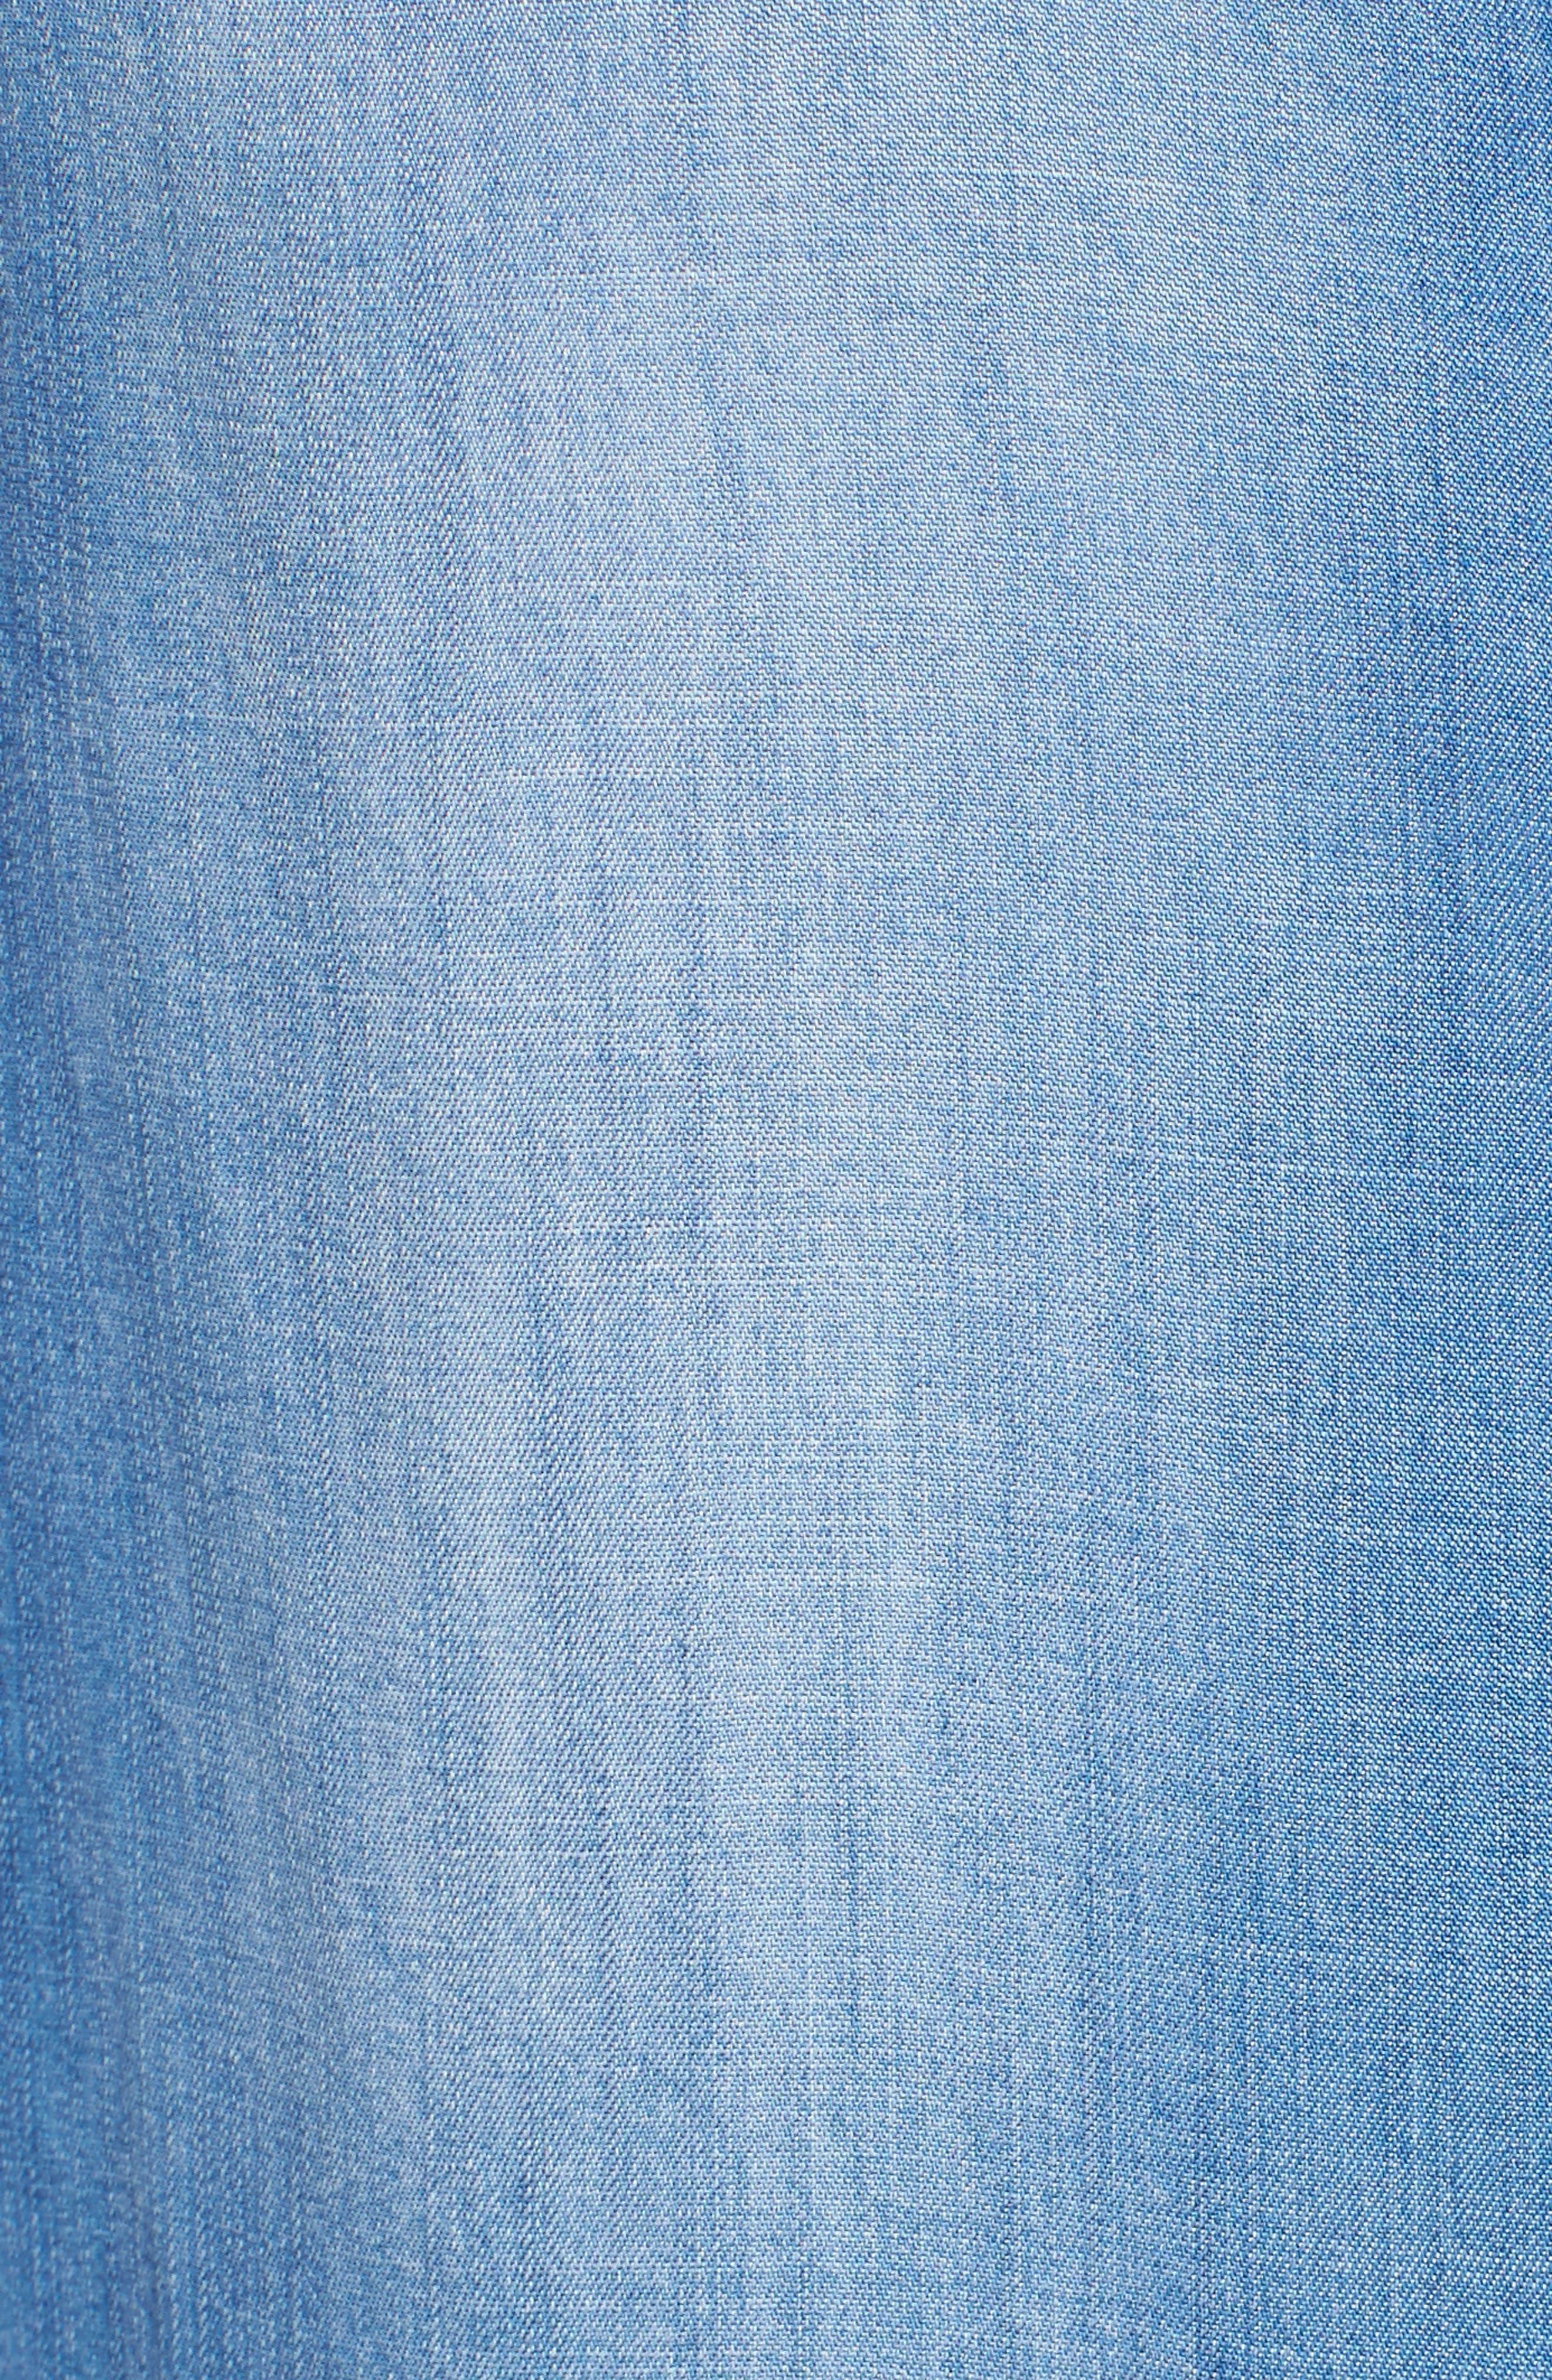 Ripped Denim Shirt,                             Alternate thumbnail 5, color,                             496